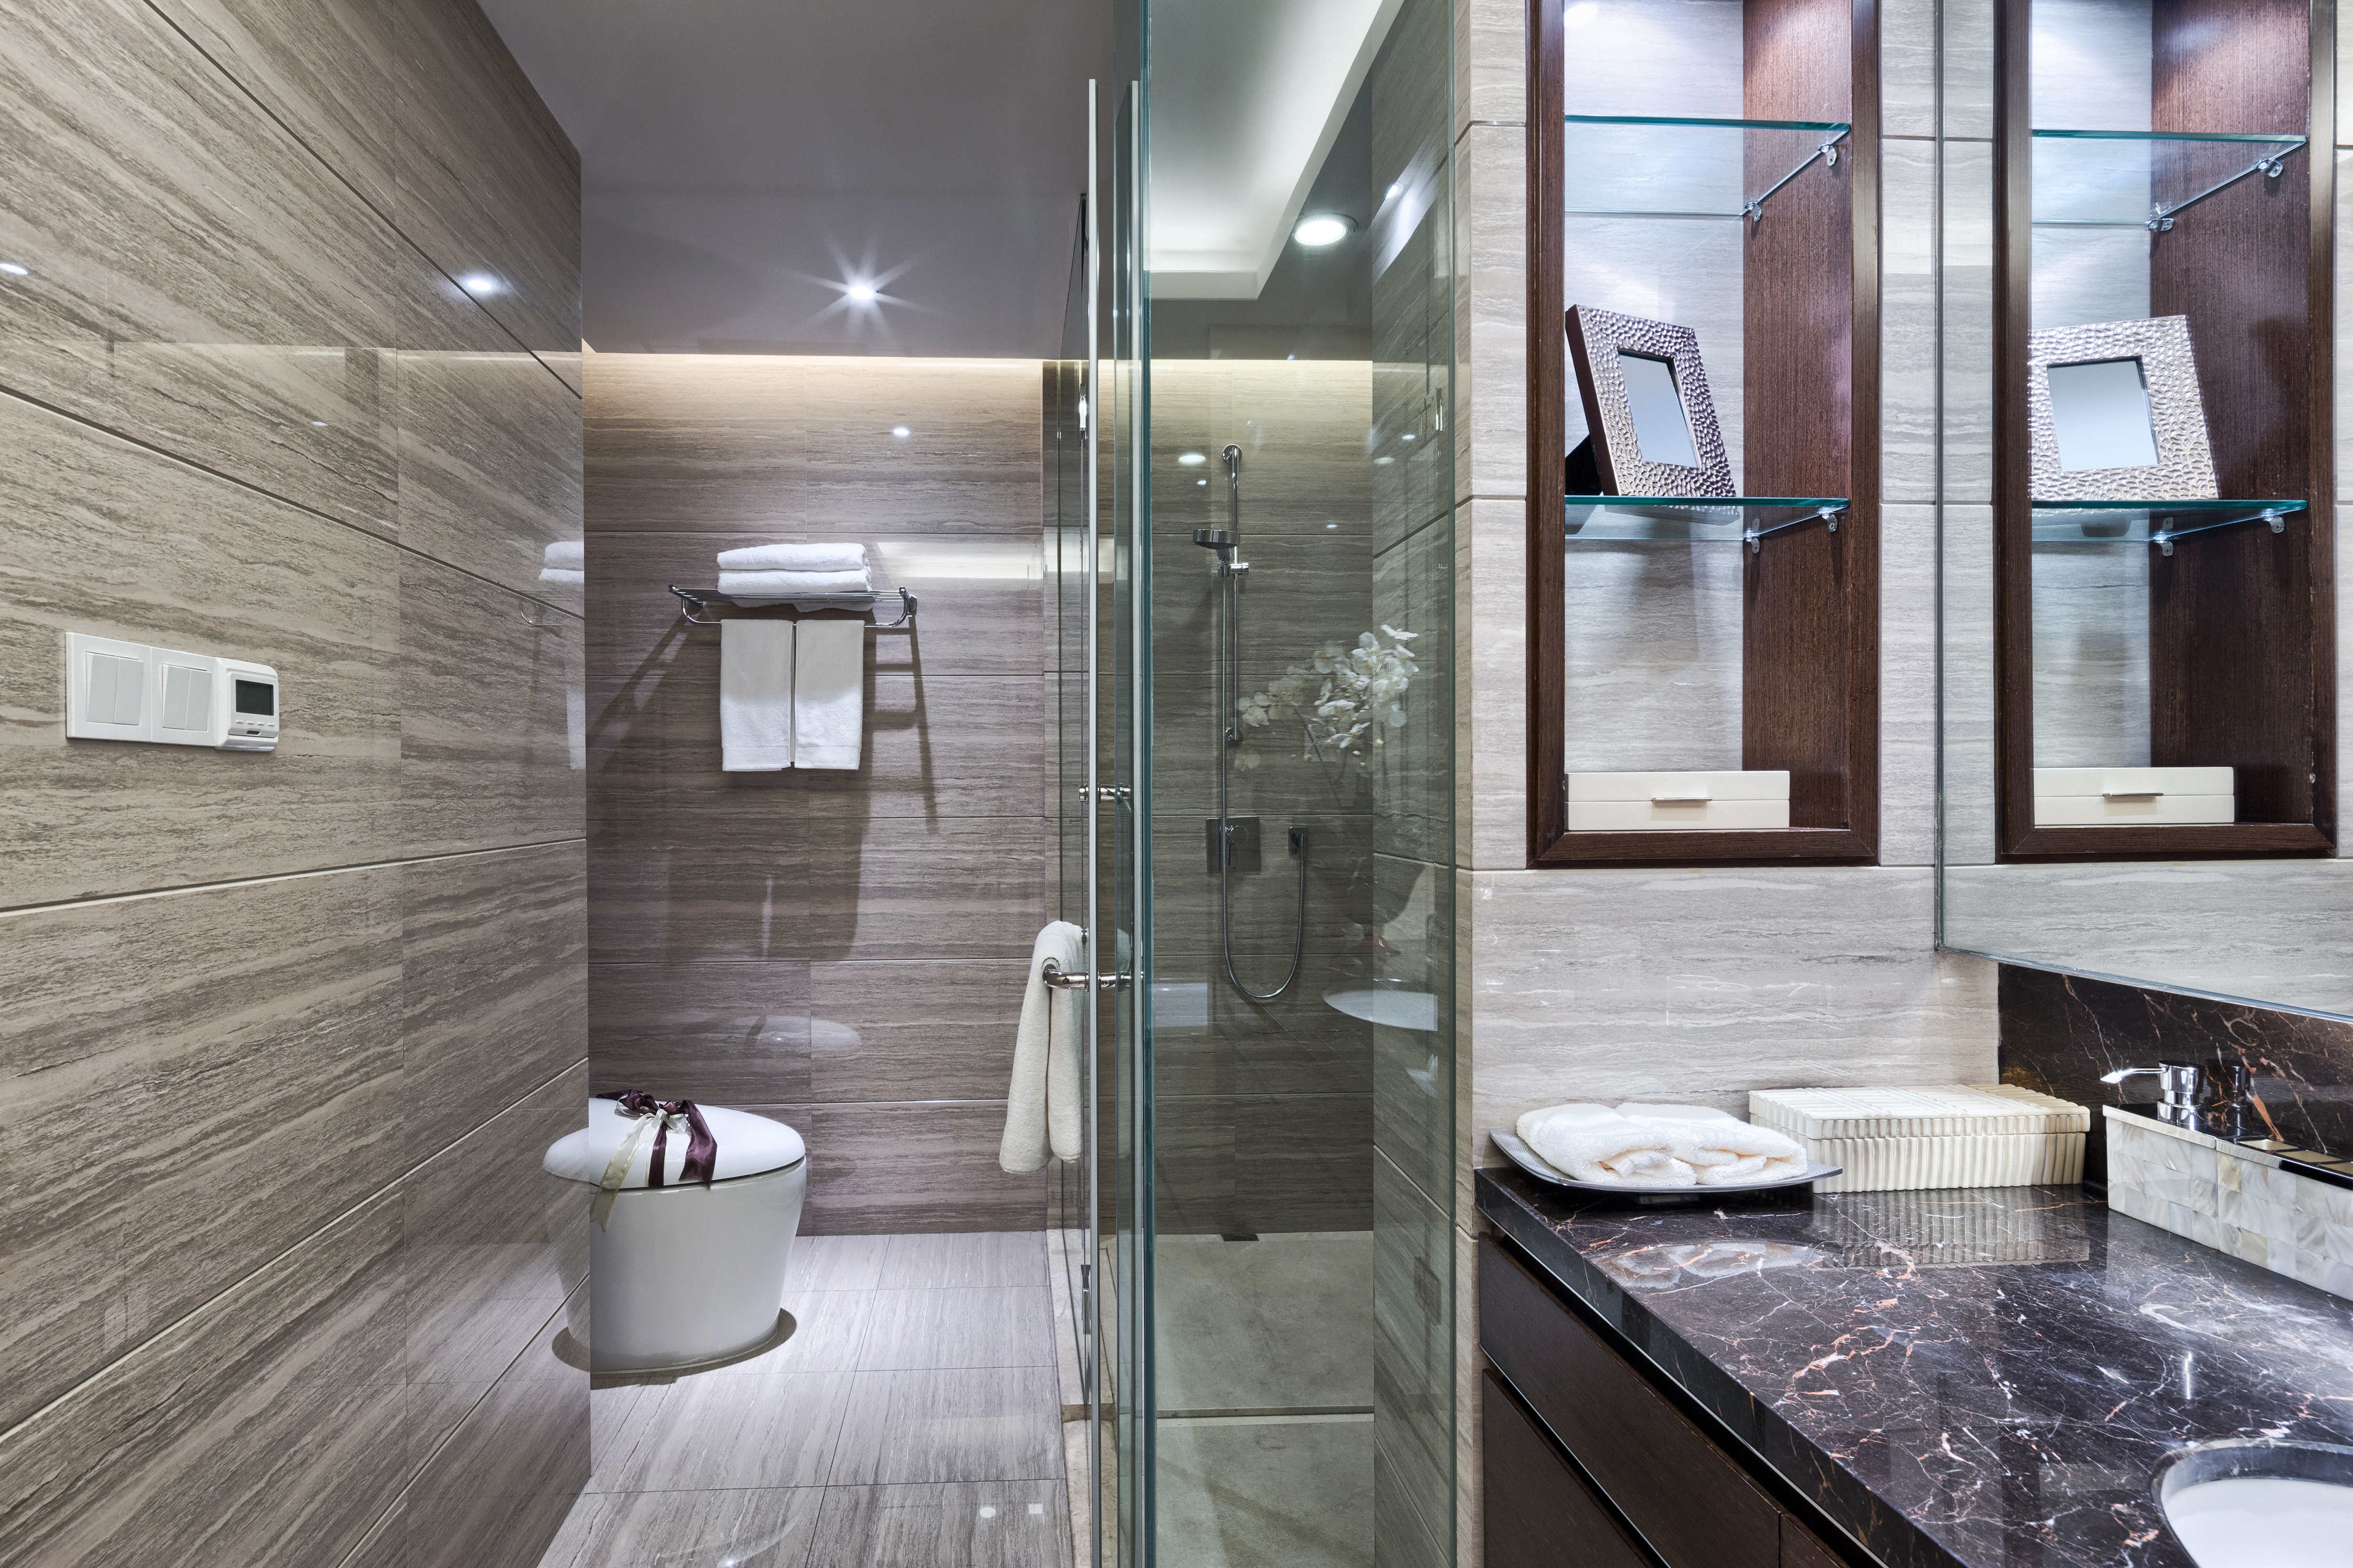 bigstock-Luxury-hotel-bathroom-interior-93522503